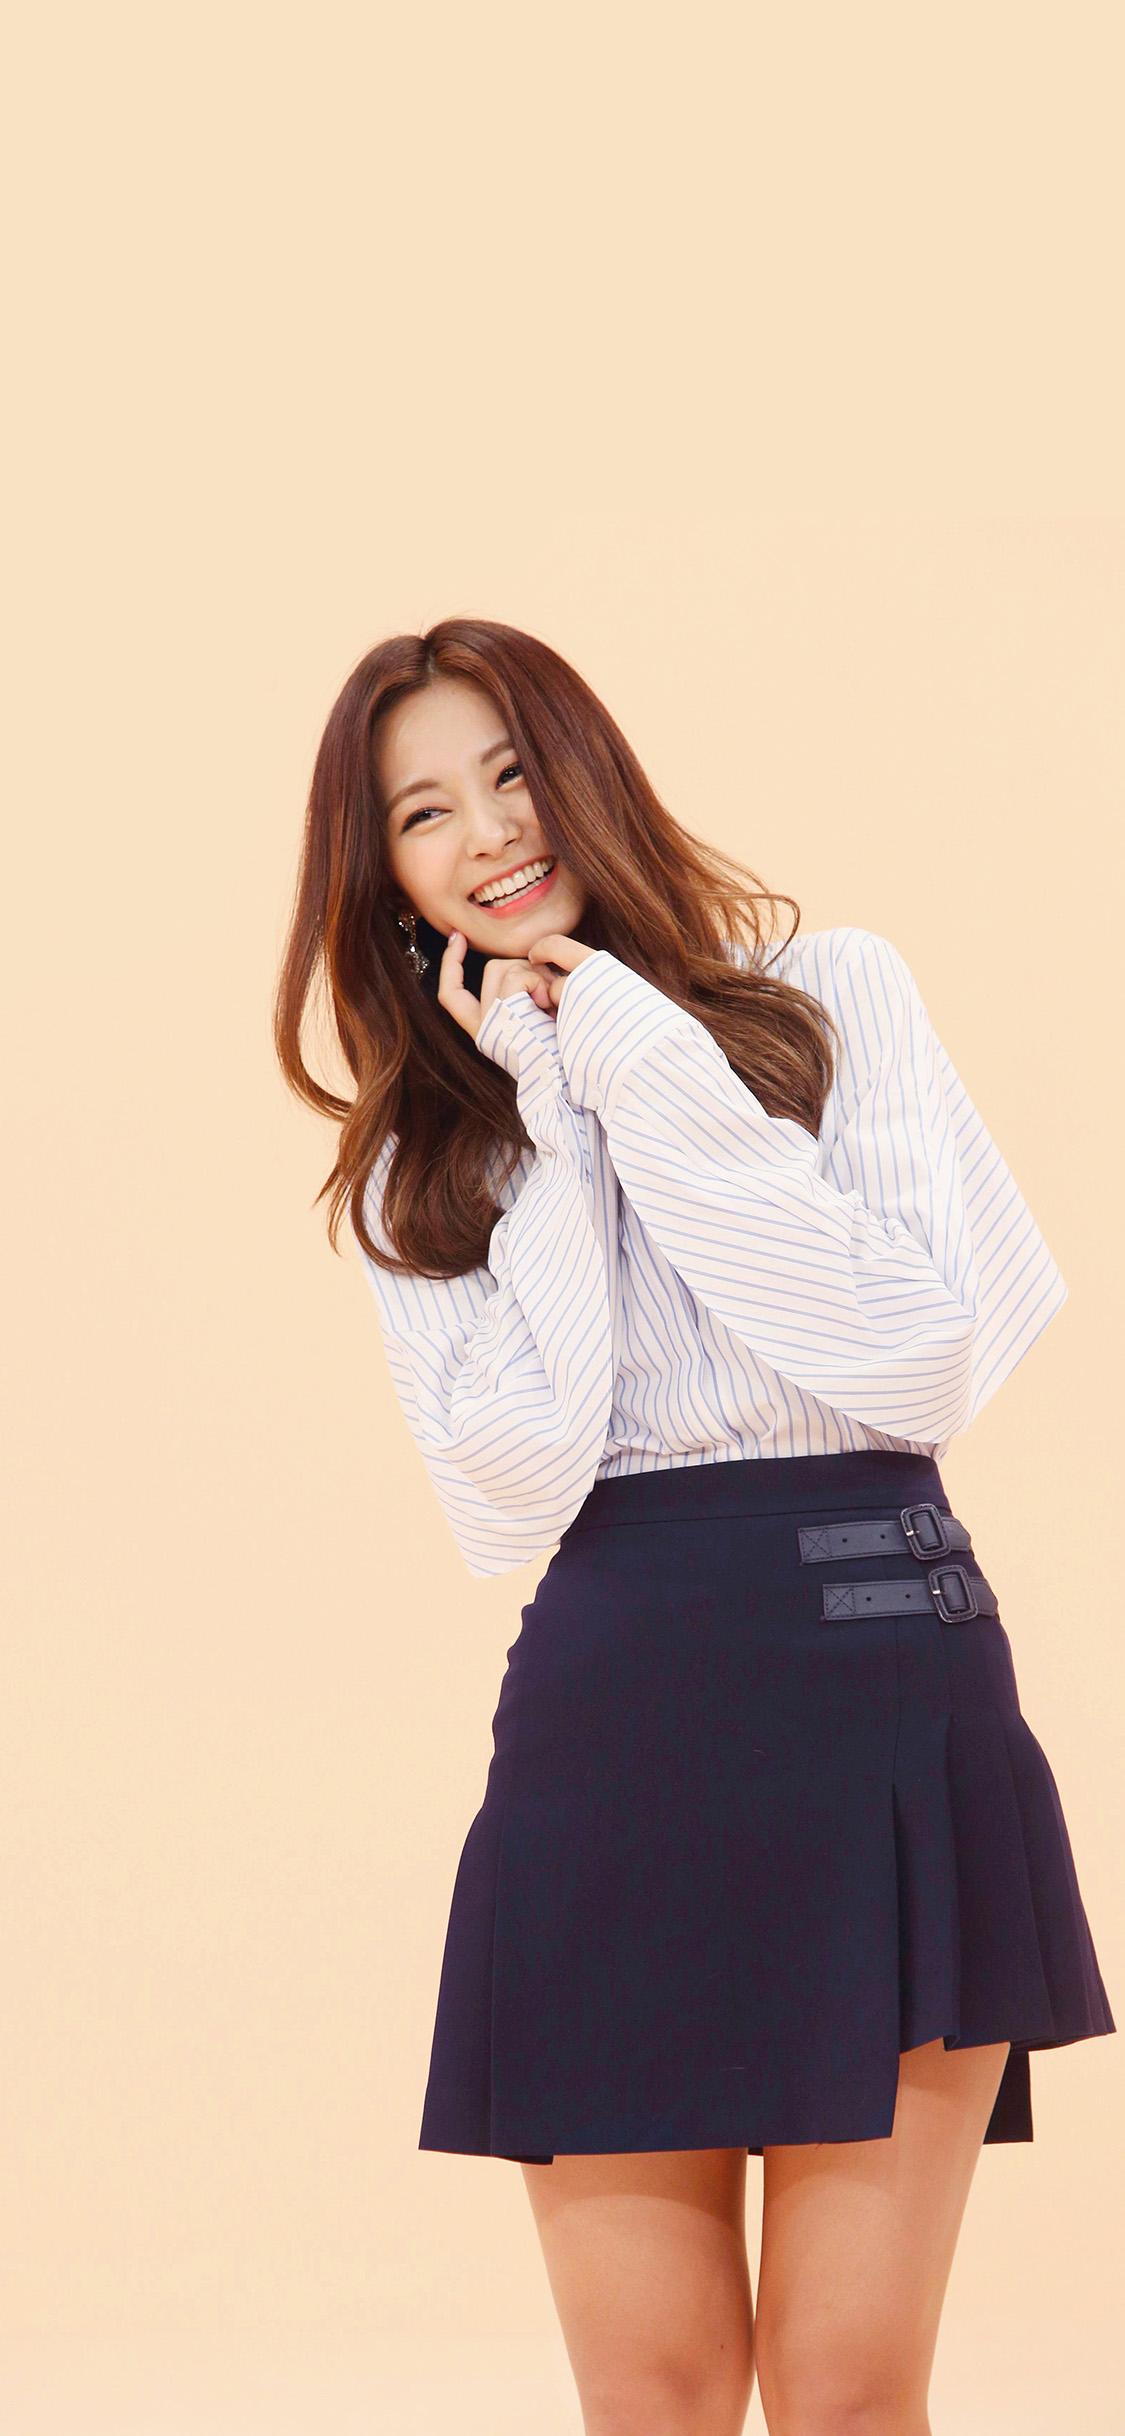 iPhonexpapers.com-Apple-iPhone-wallpaper-hr20-kpop-tzuyu-smile-girl-asian